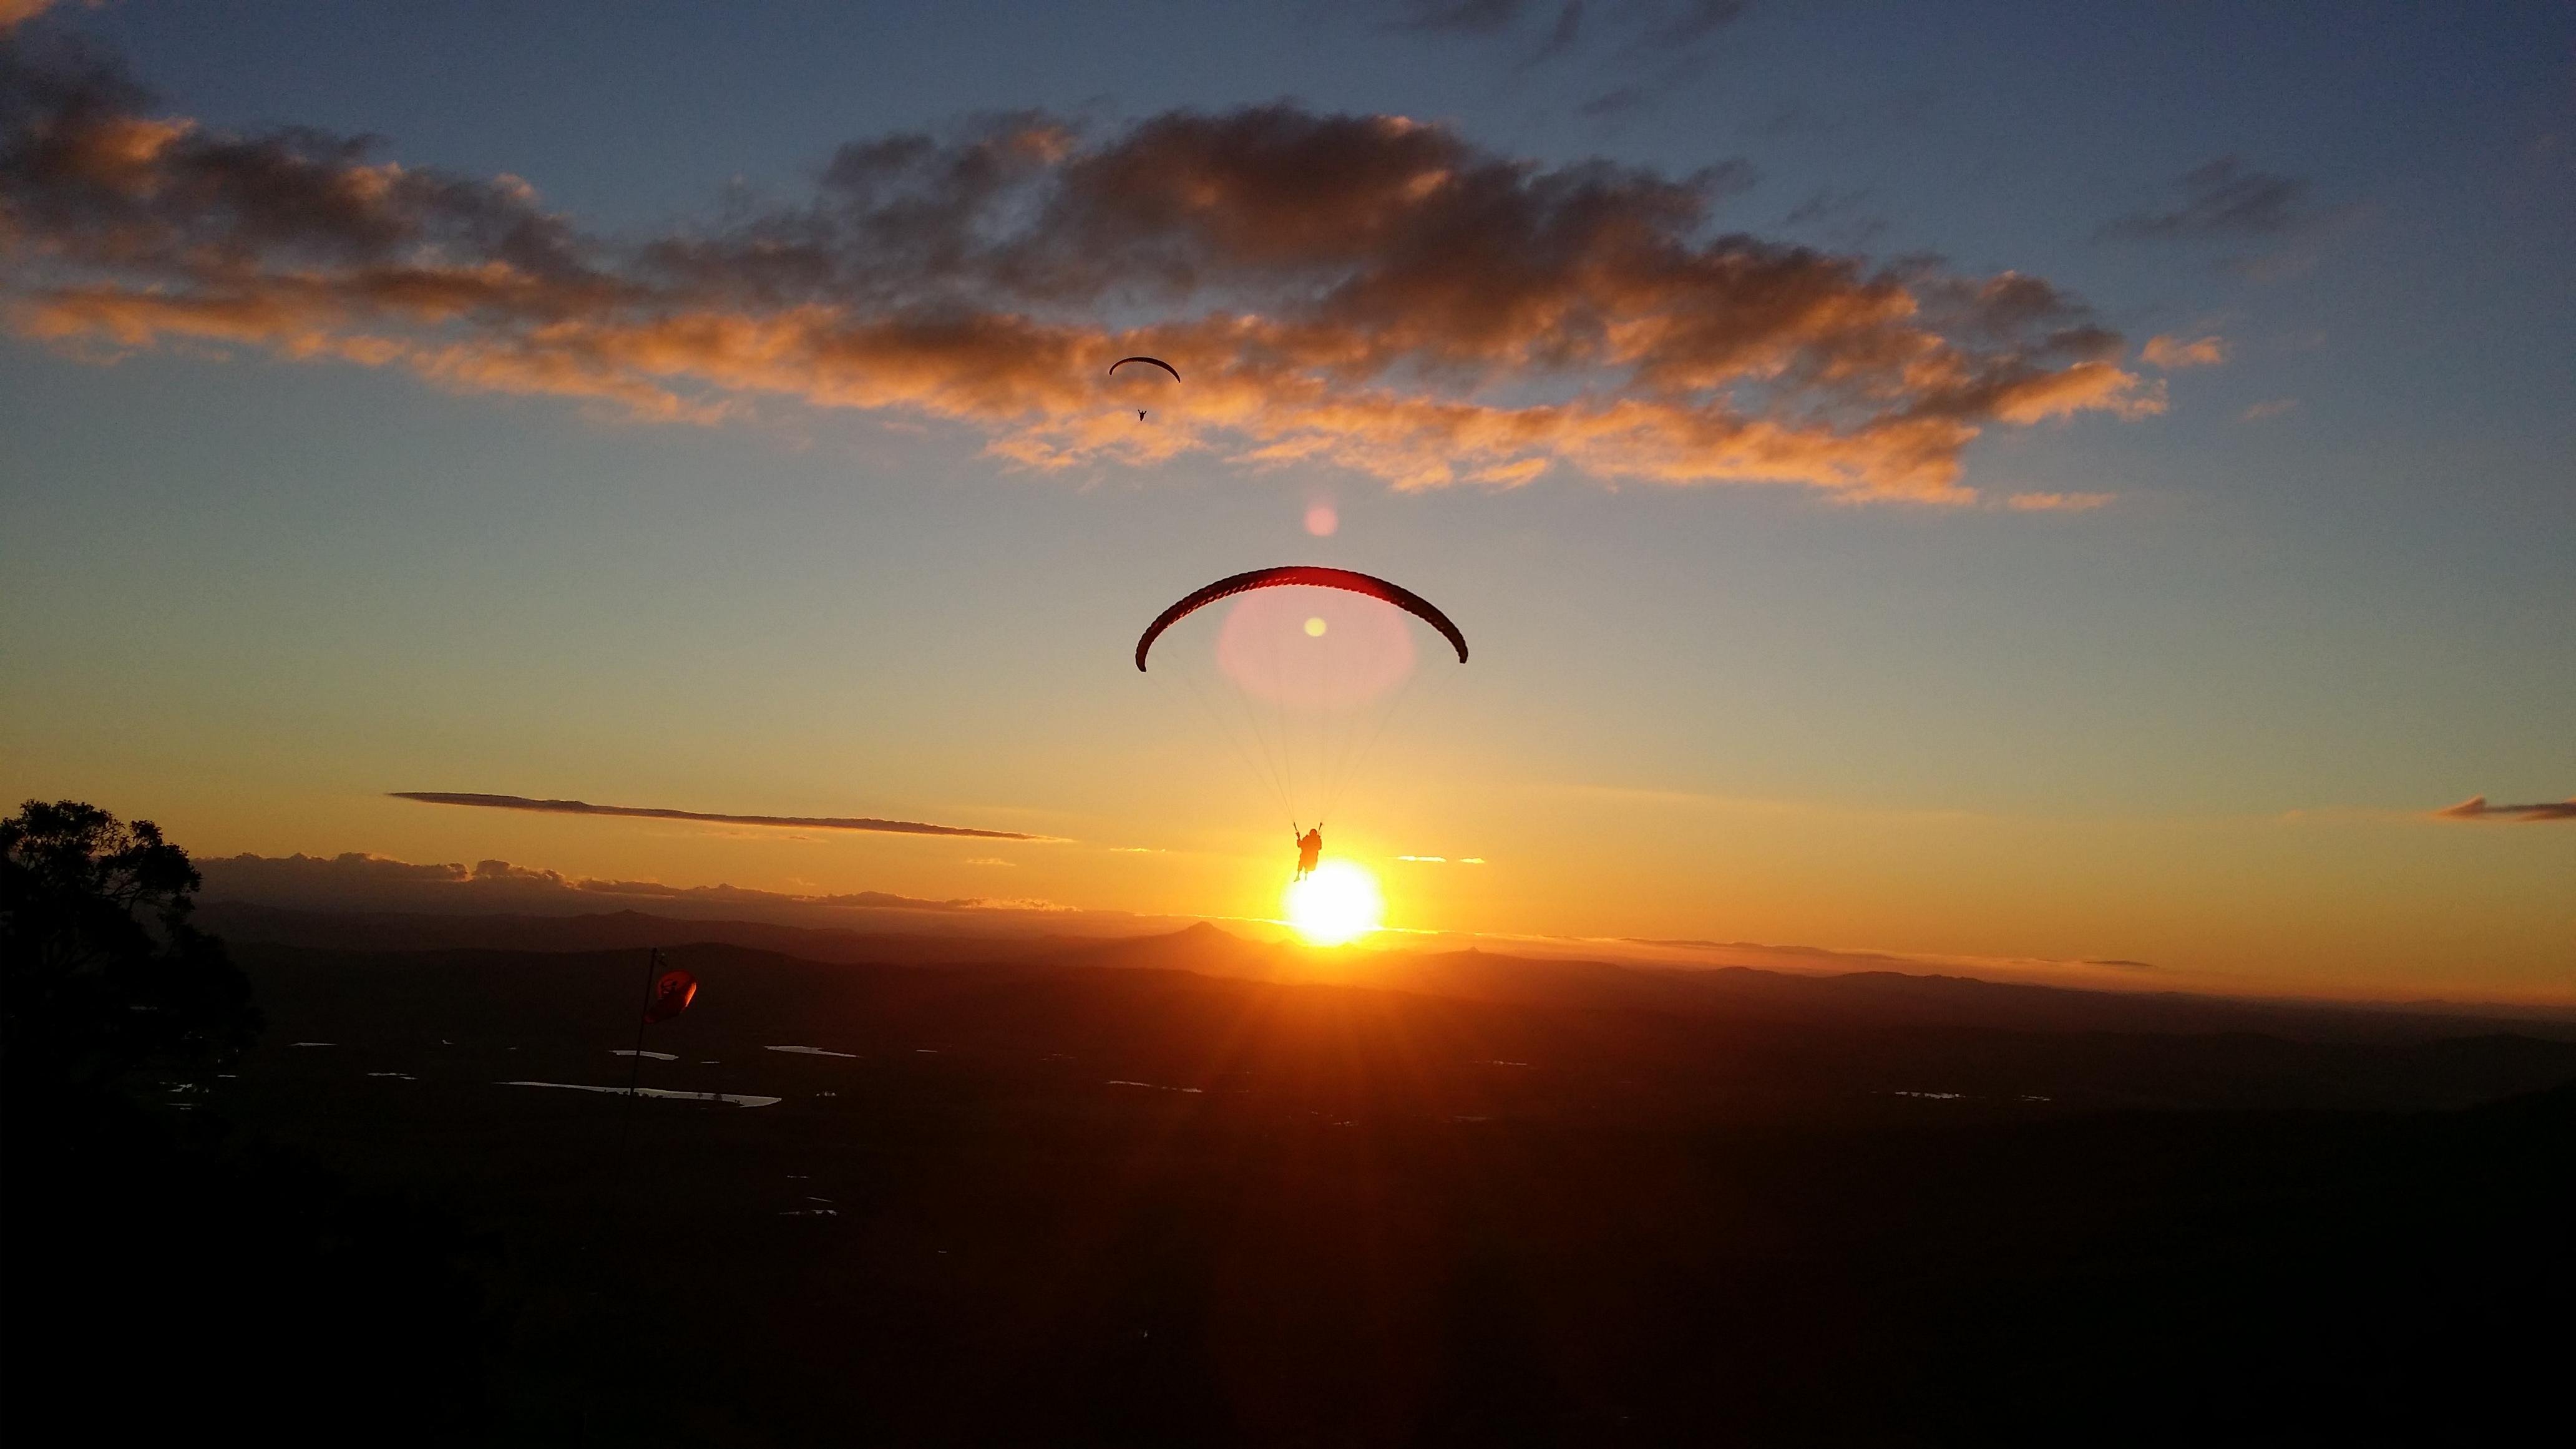 Mt Tamborine Sunset Paraglide by Dom Colvile